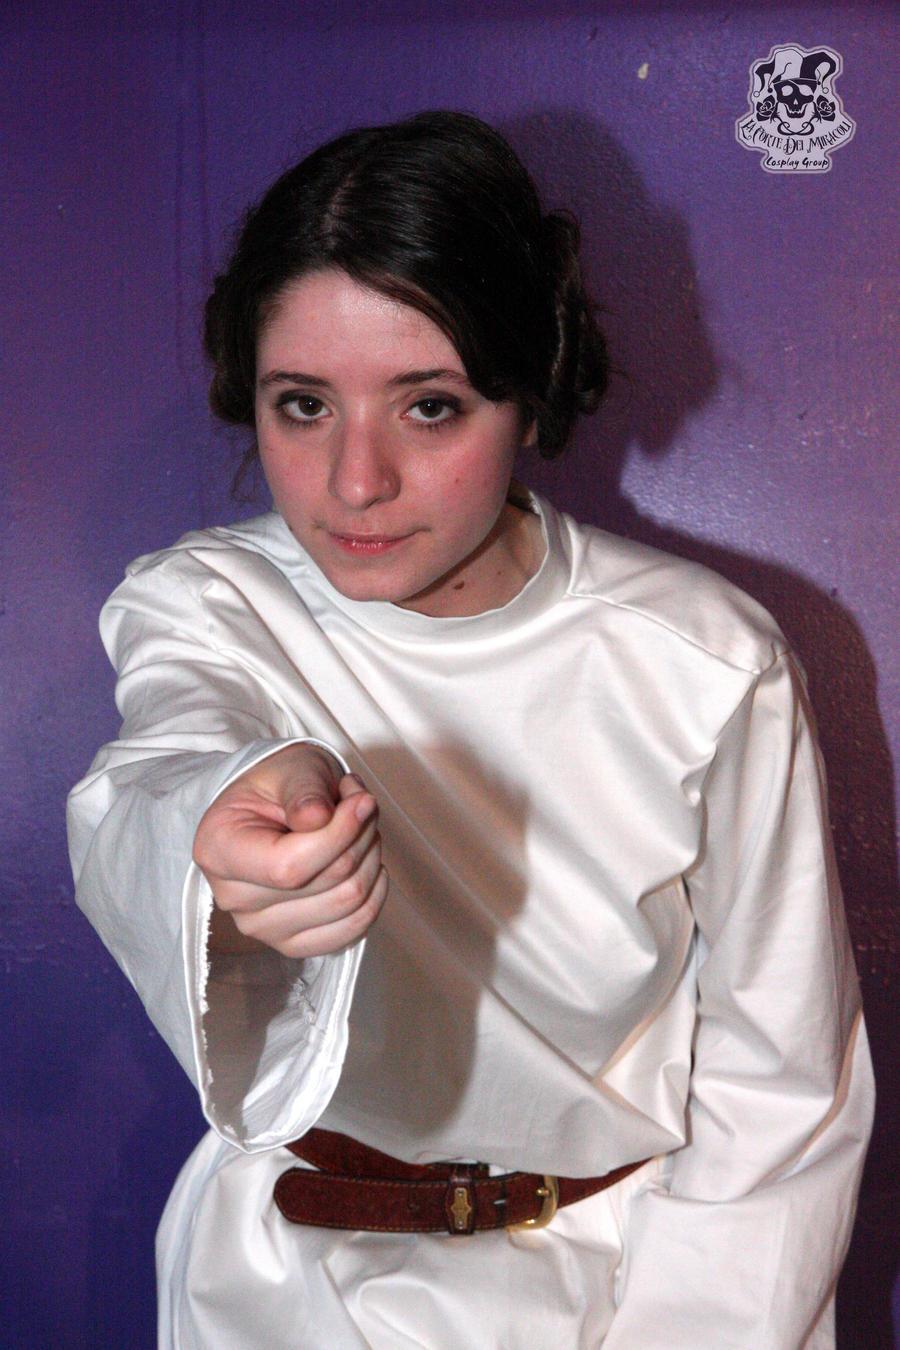 Help me, Obi Wan Kenobi by MiracoliCosplay